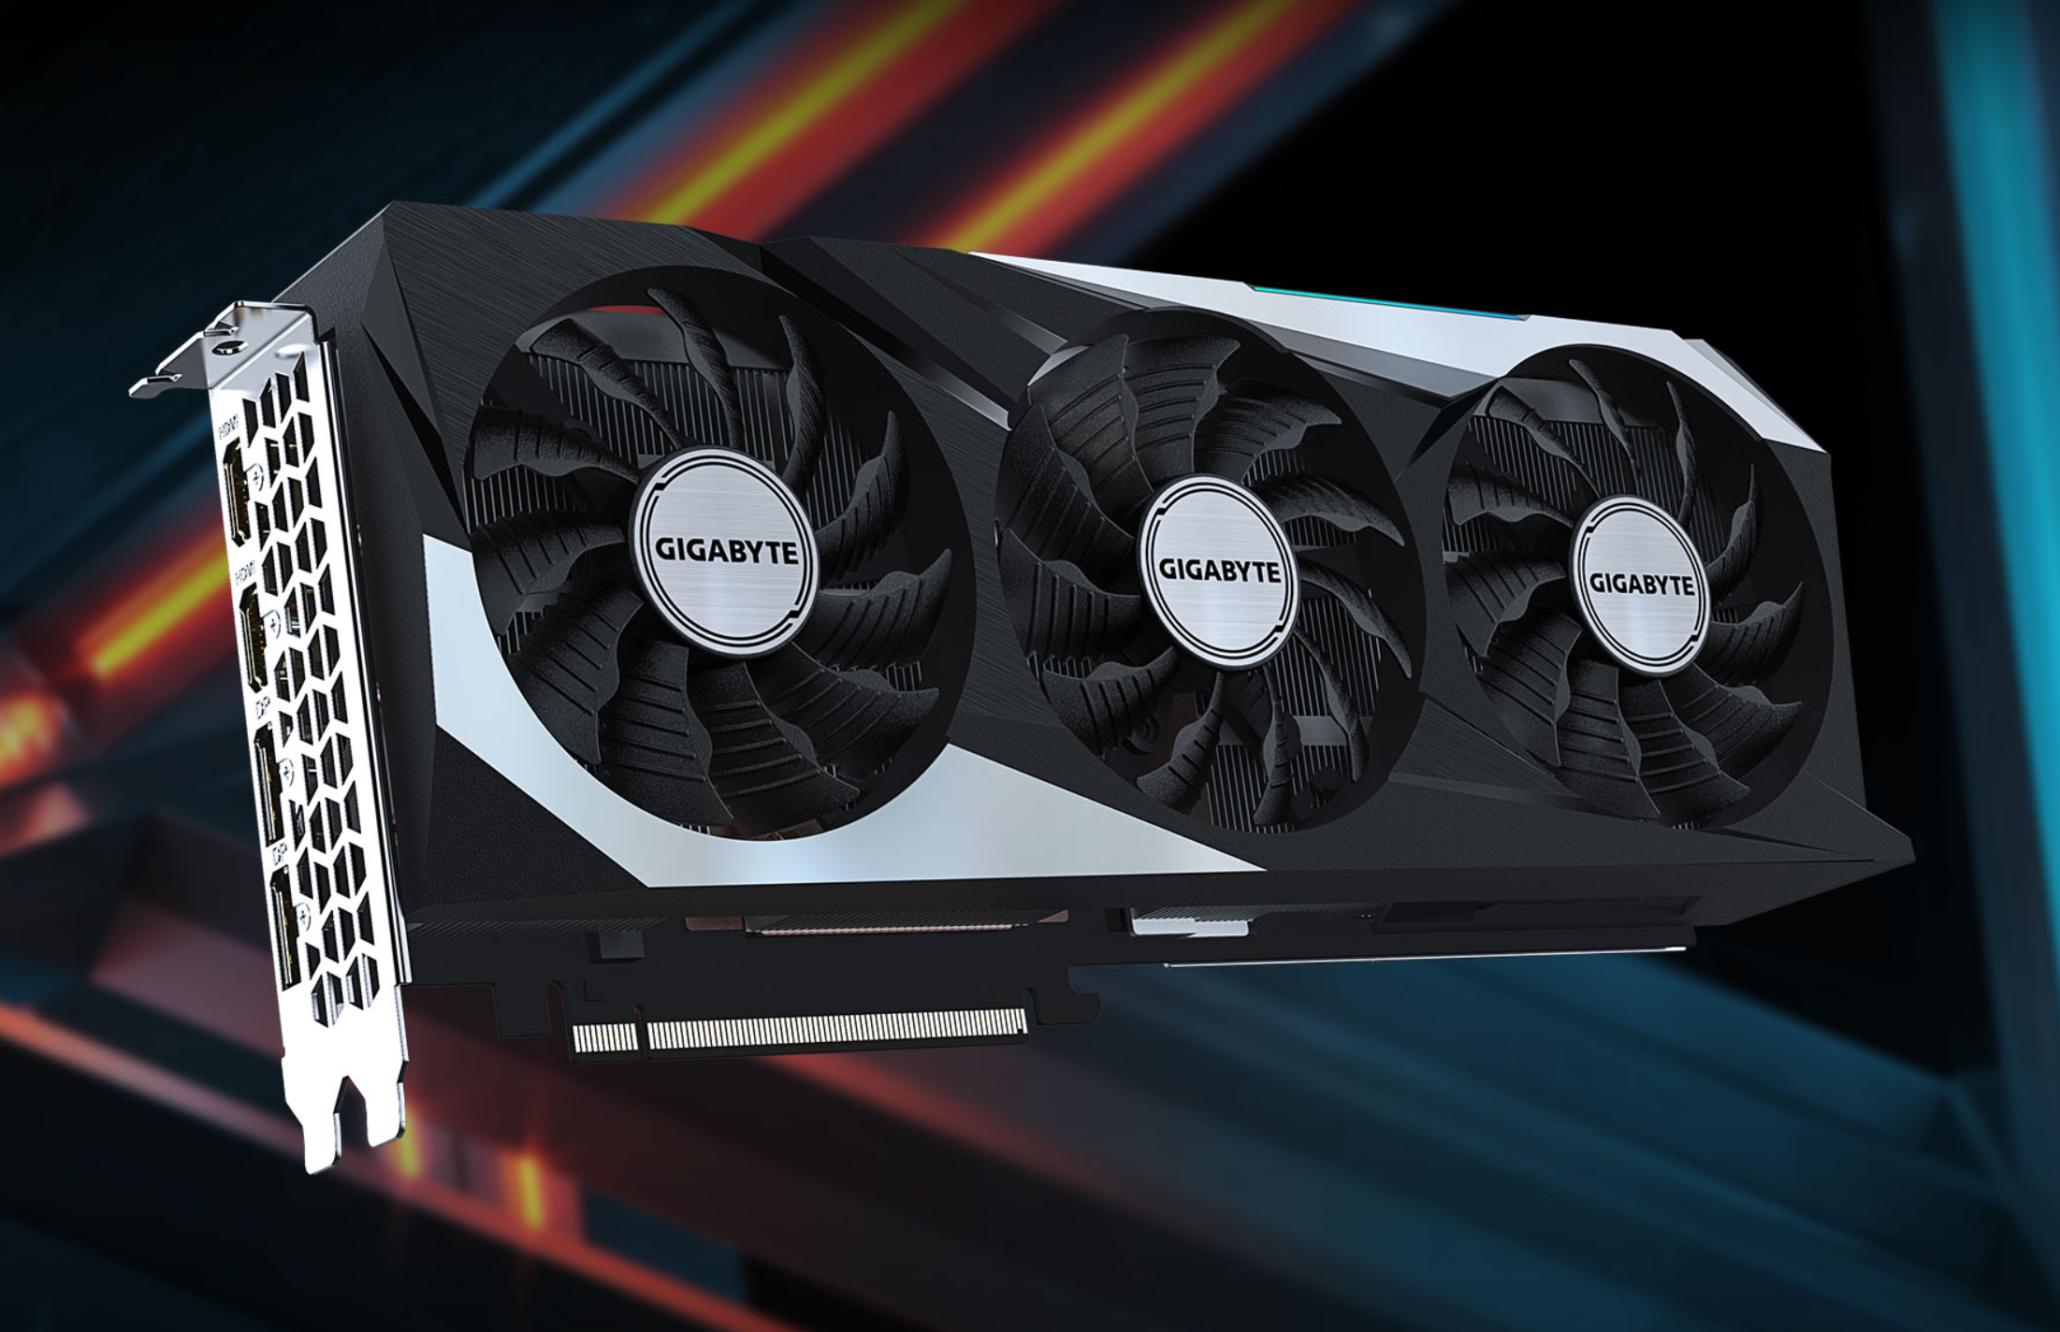 Gigabyte Mengungkapkan Kartu Grafis Radeon RX 6900 XT Gaming OC